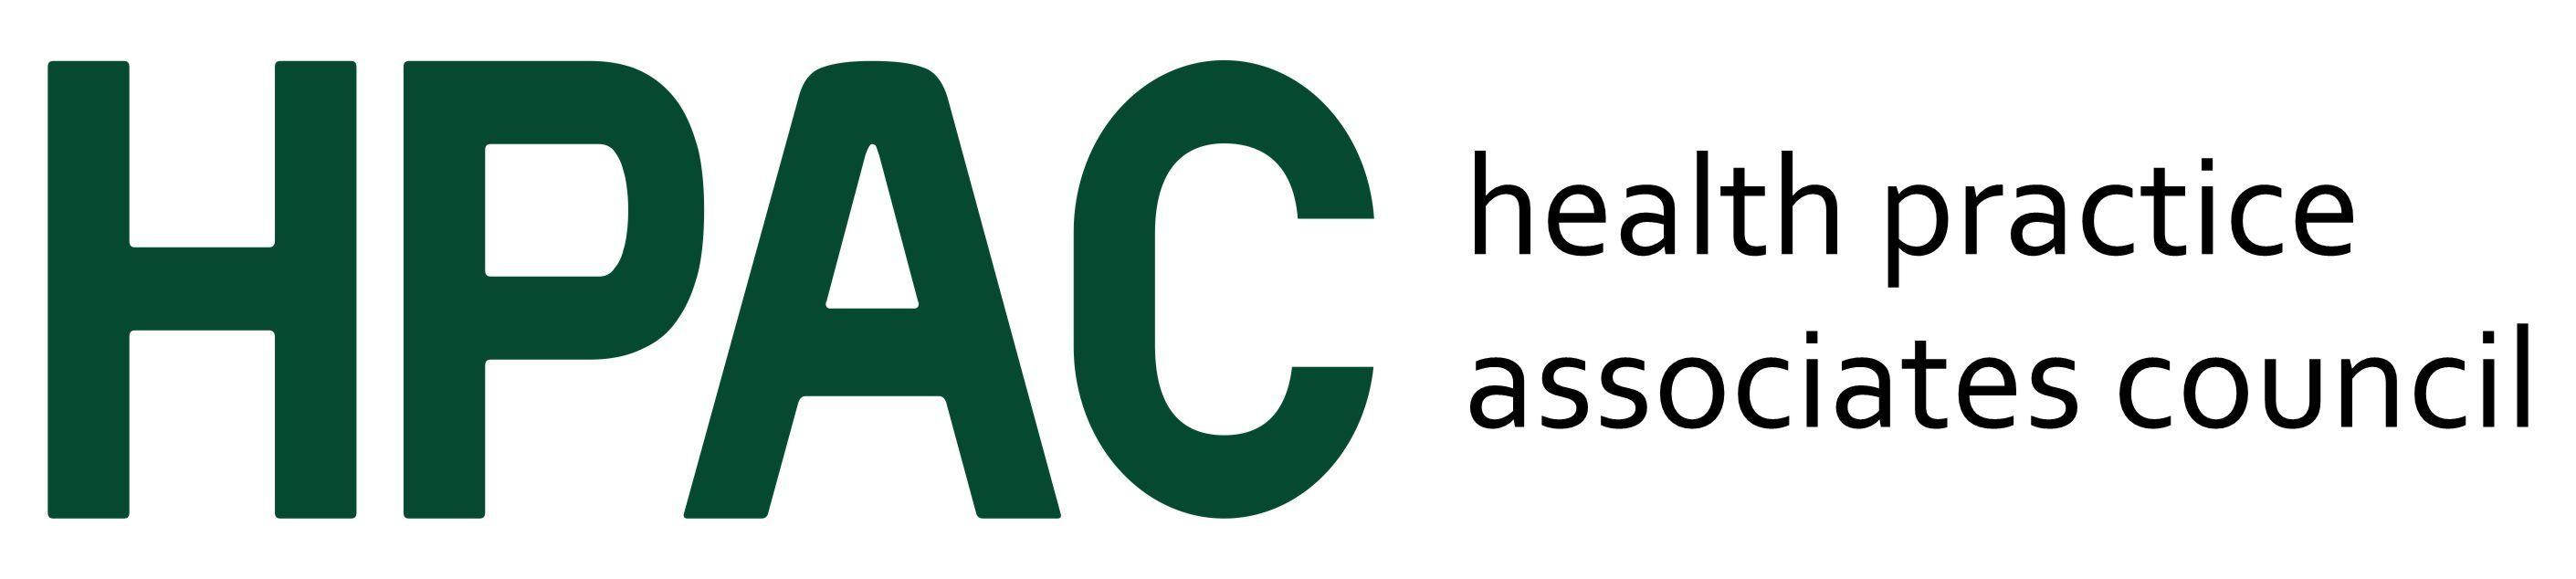 Health Practice Associates